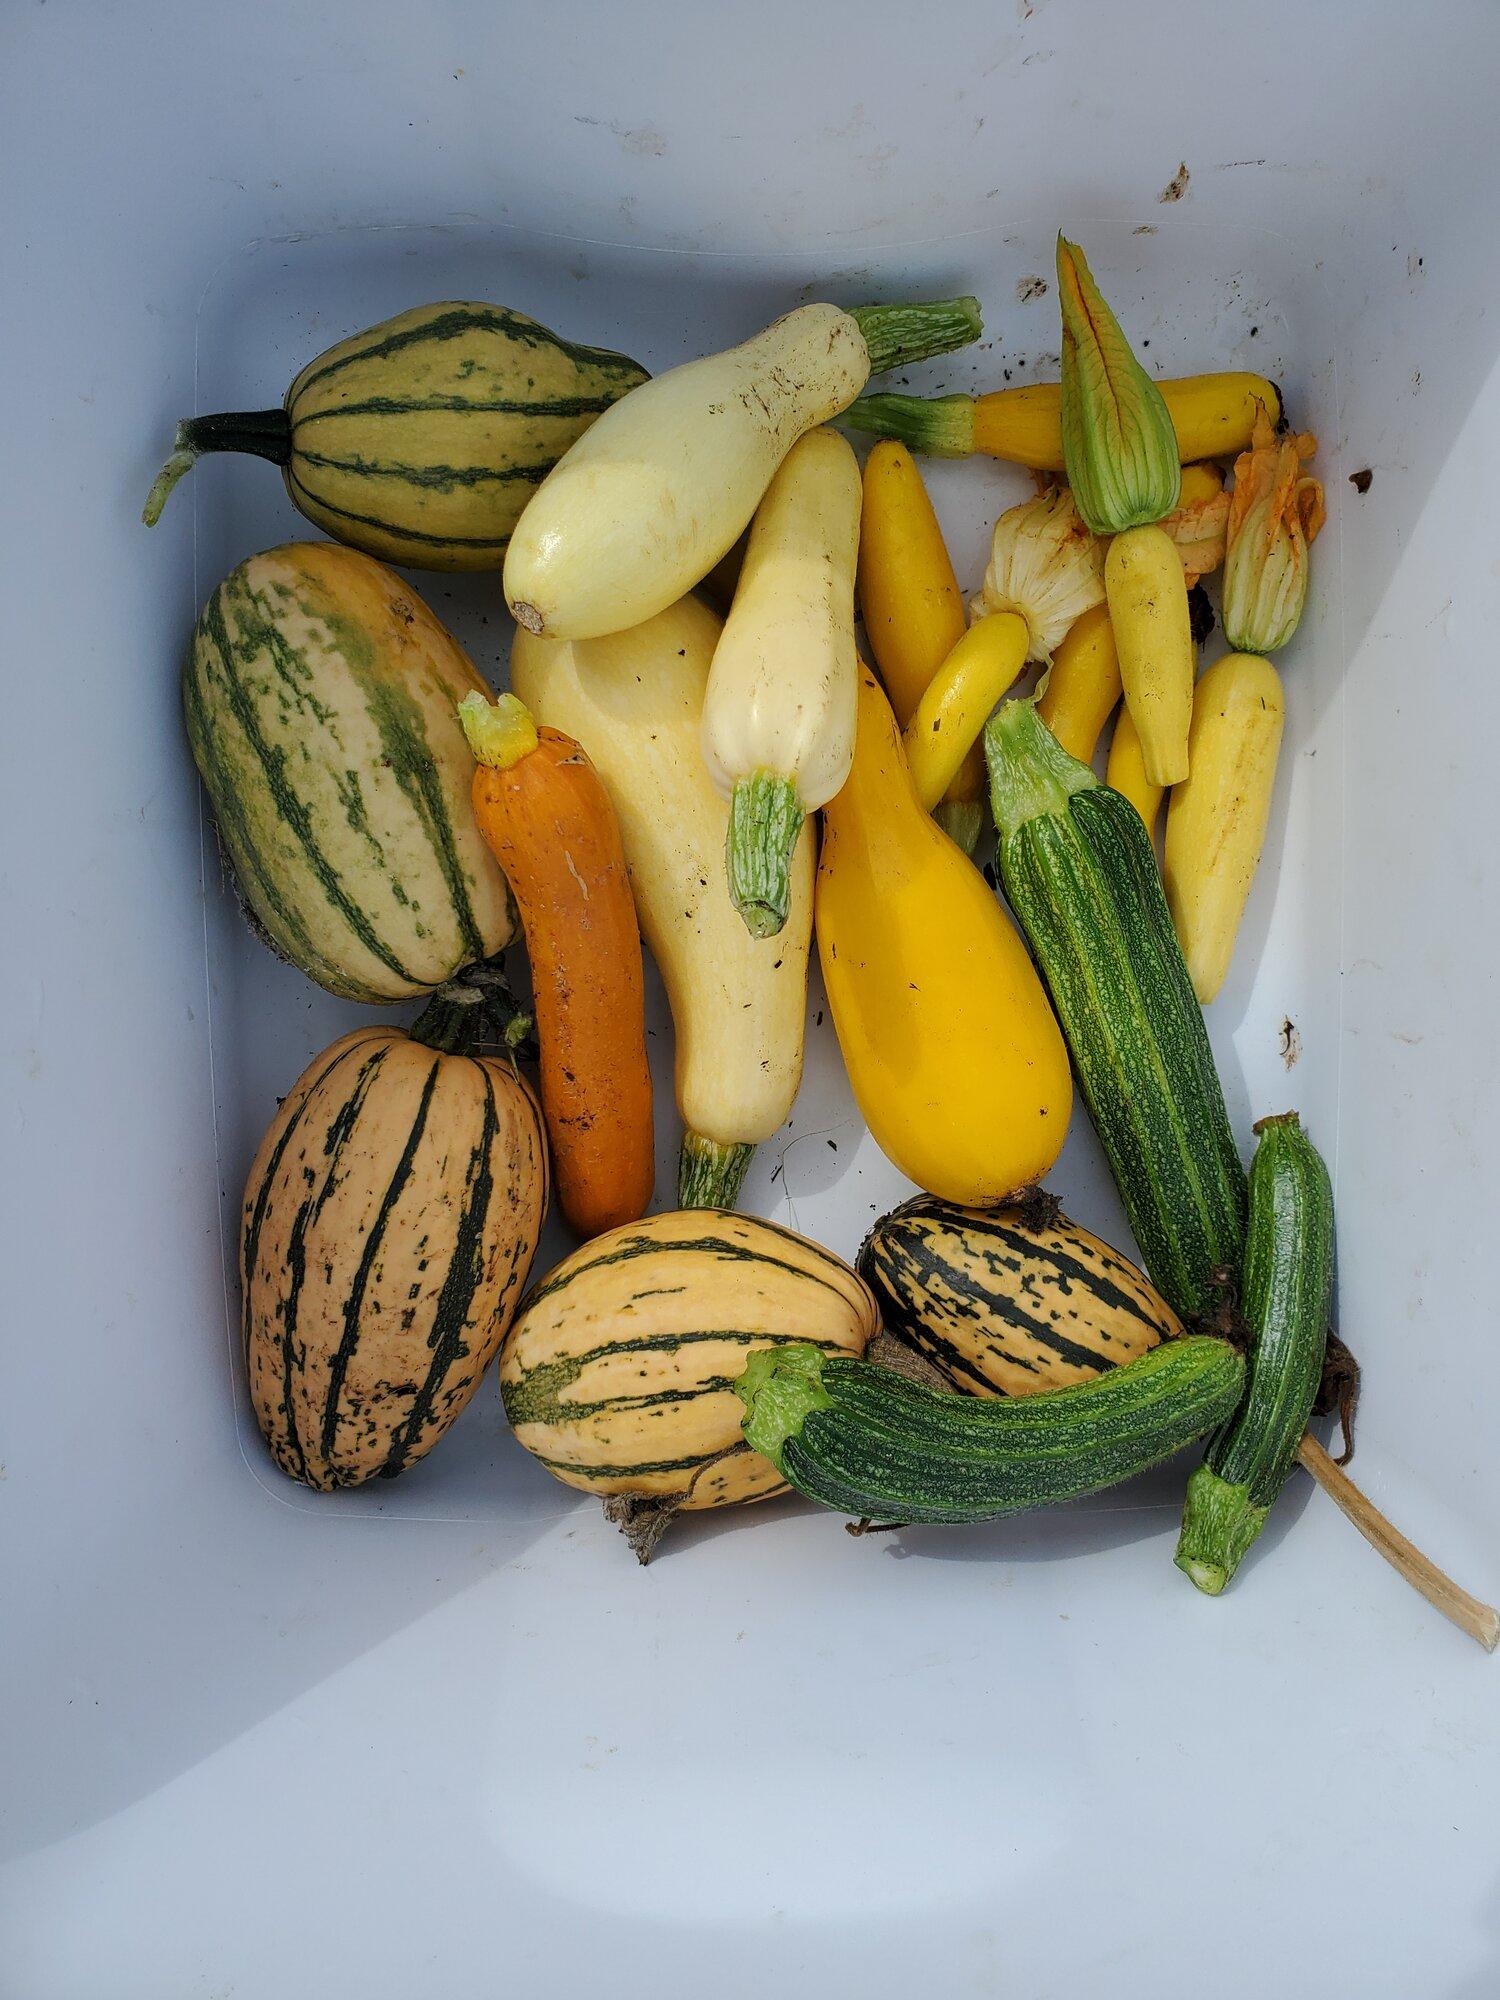 Final zuc harvest 9.23.20.jpg